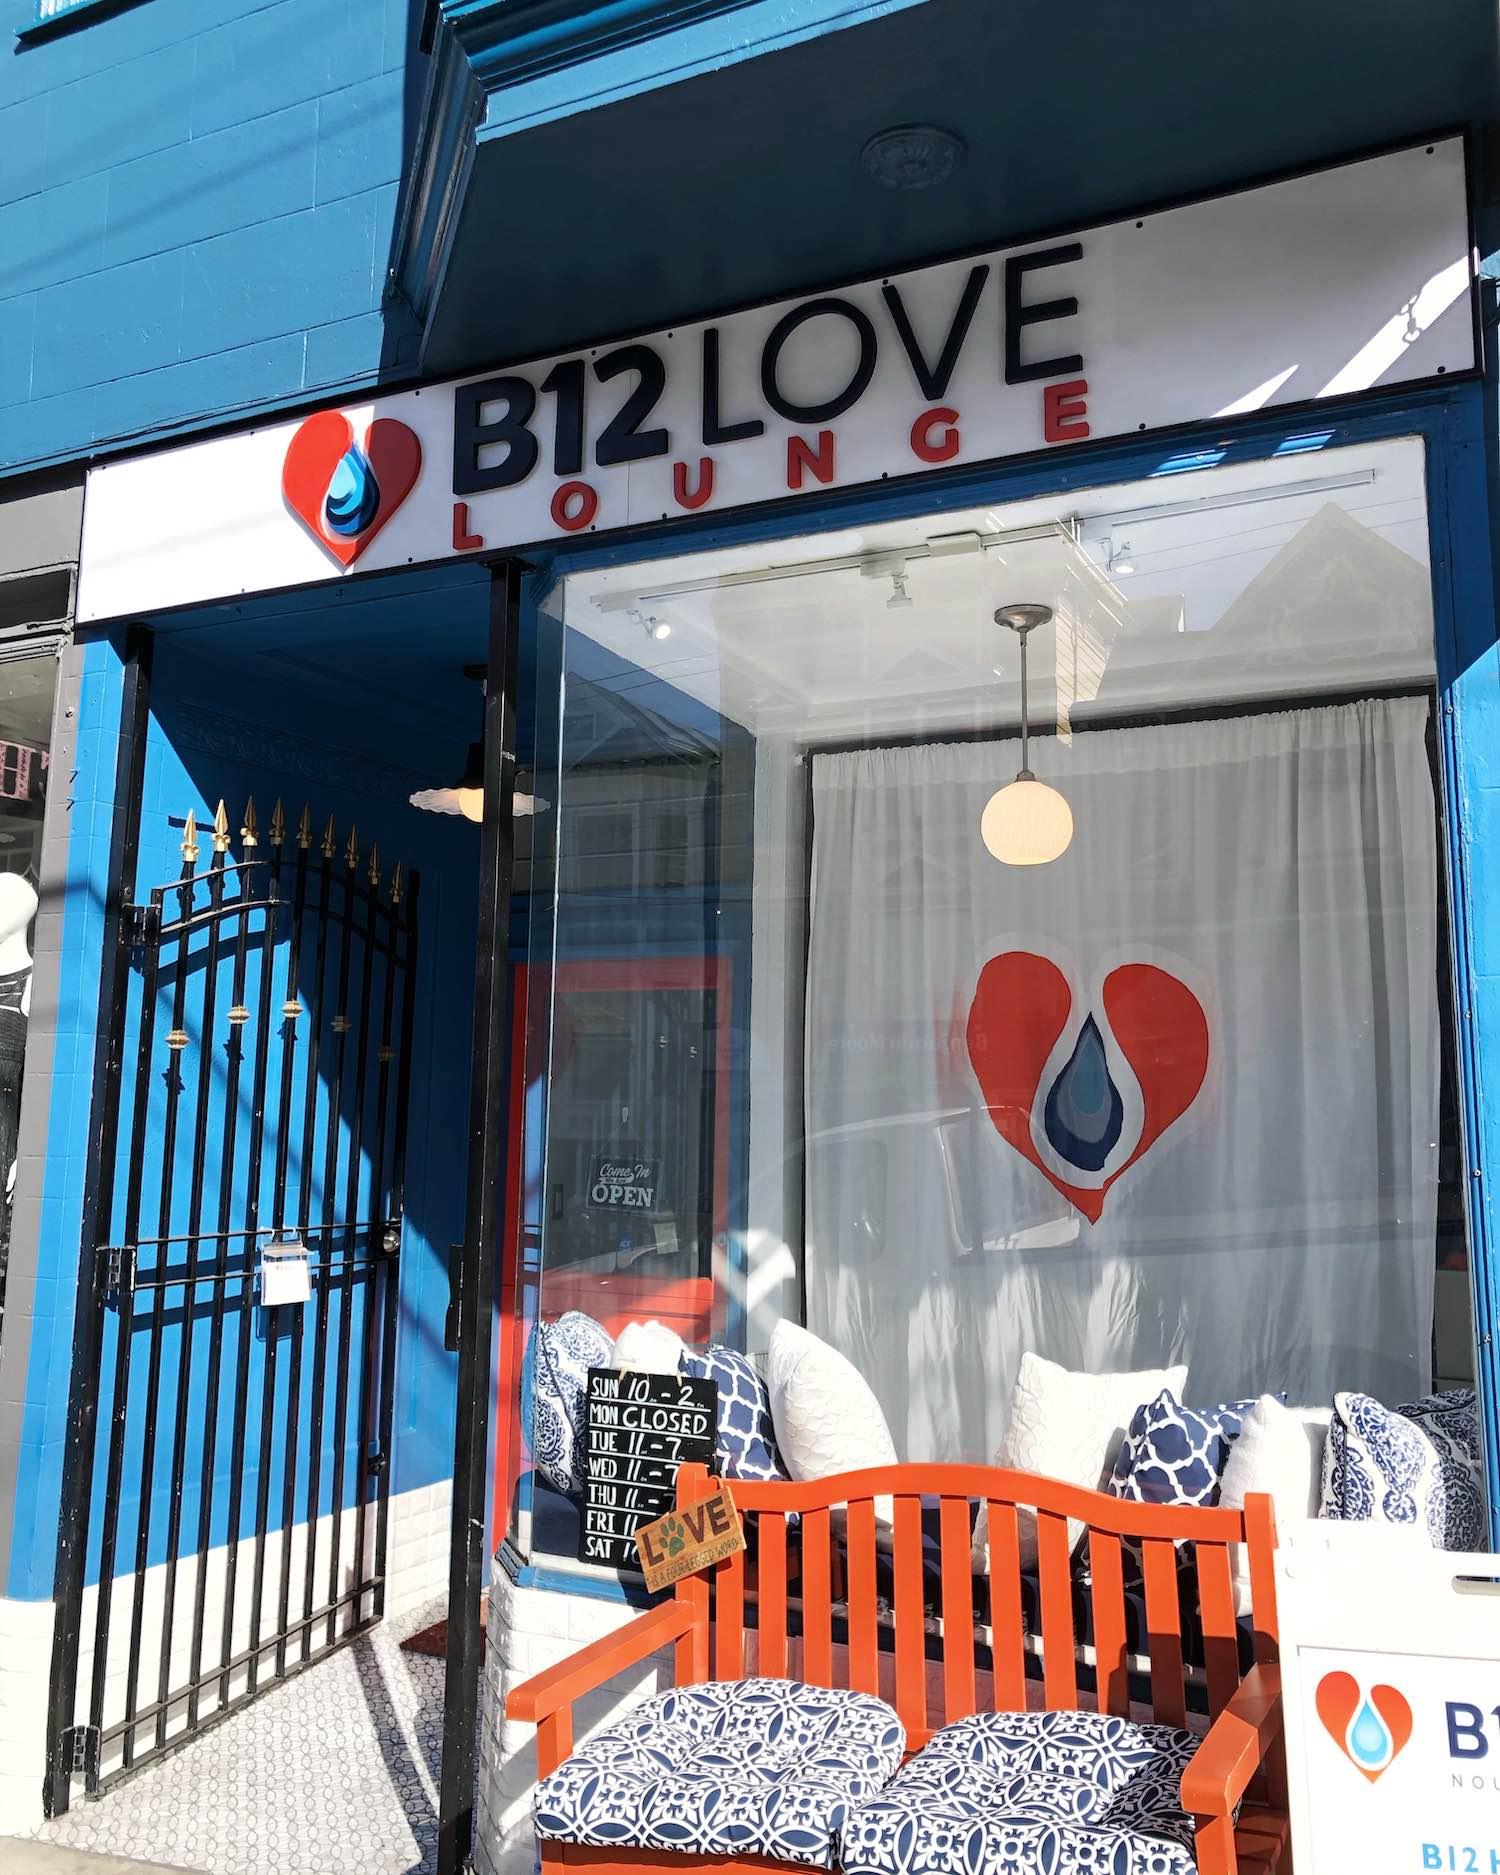 B12 LOVE San Francisco